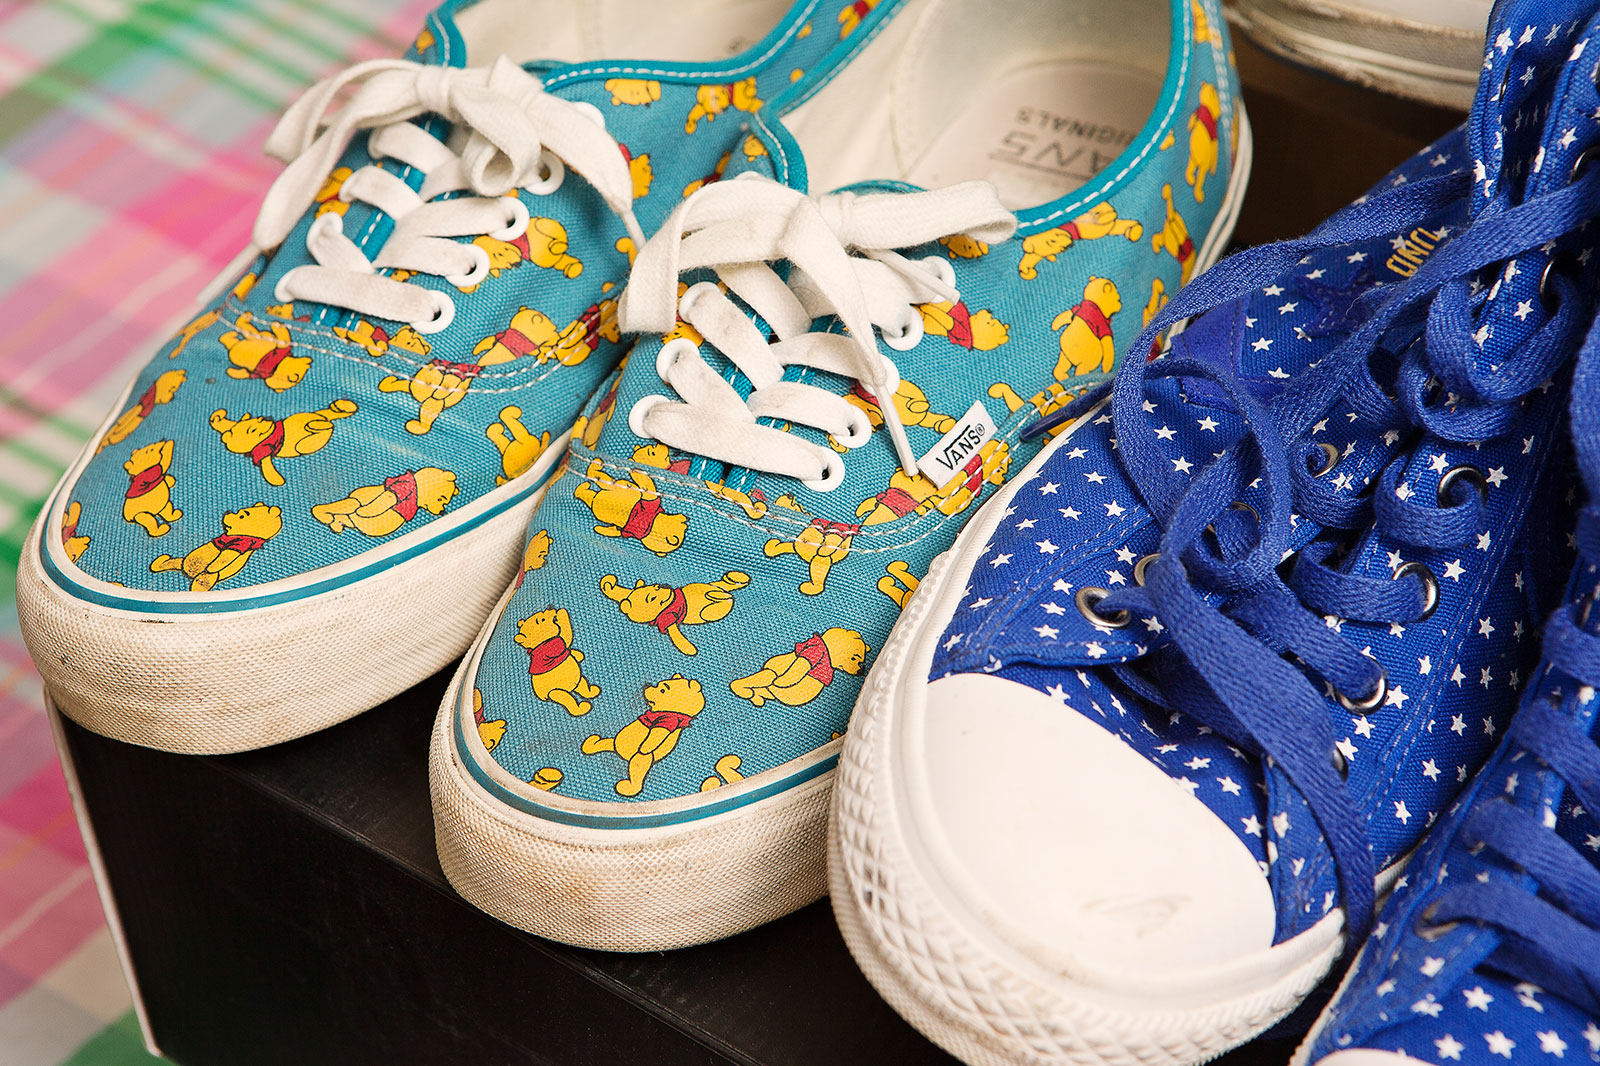 Sneakerhead09